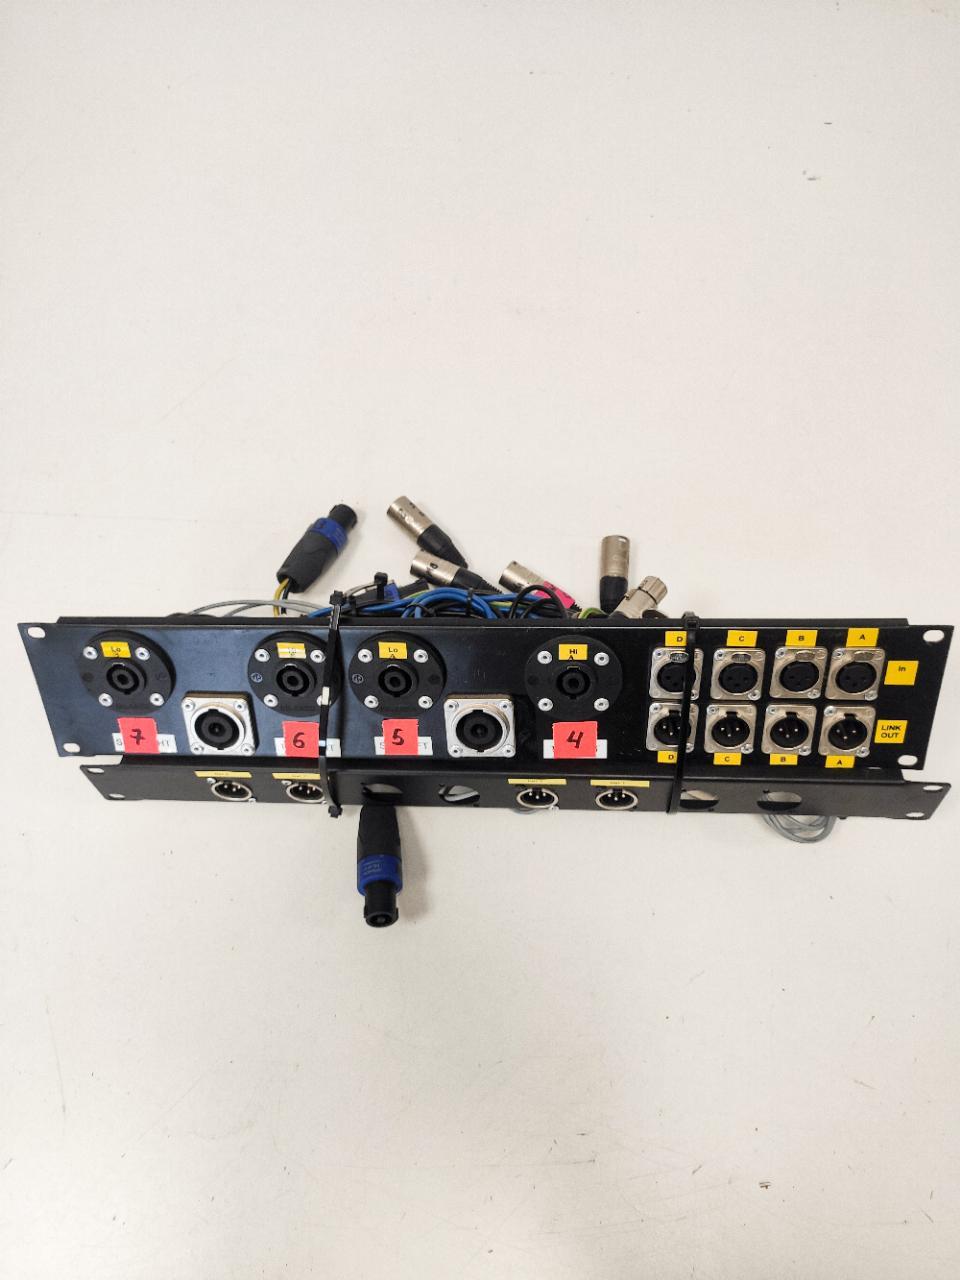 I/O panel for amprack